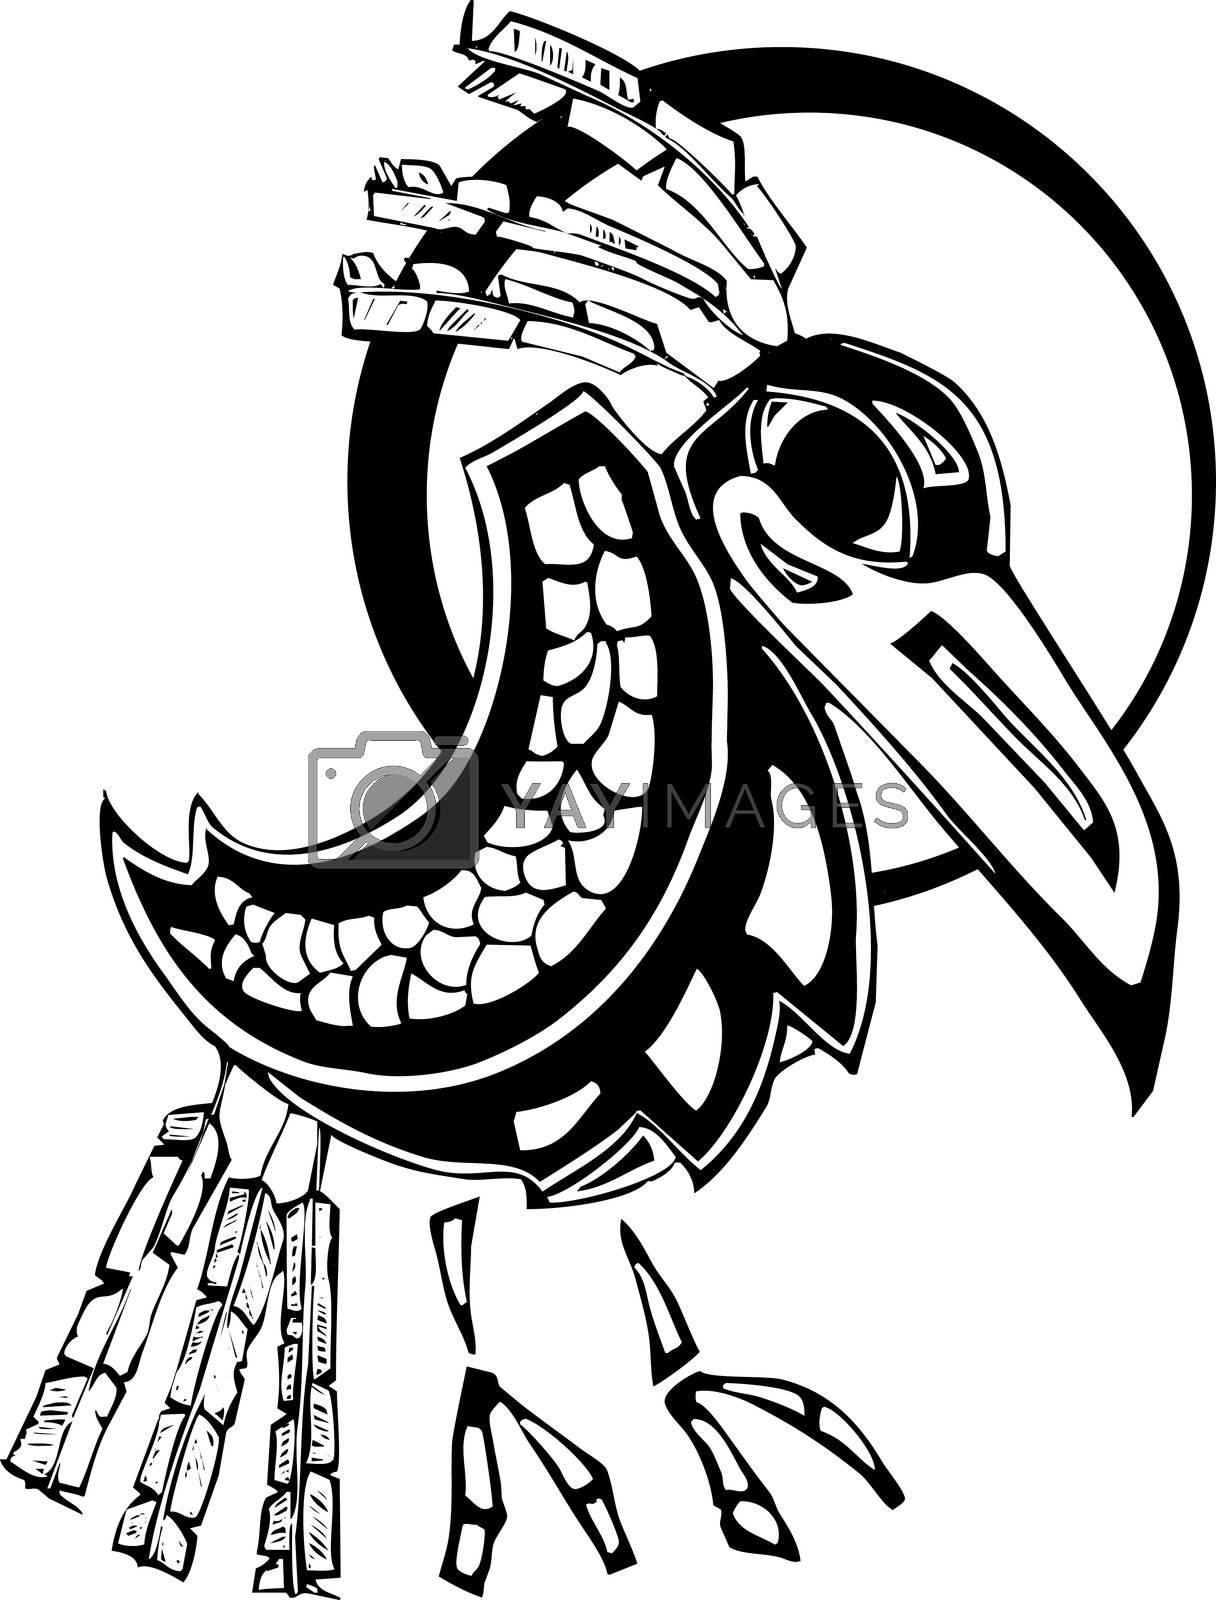 Raven by Xochicalco